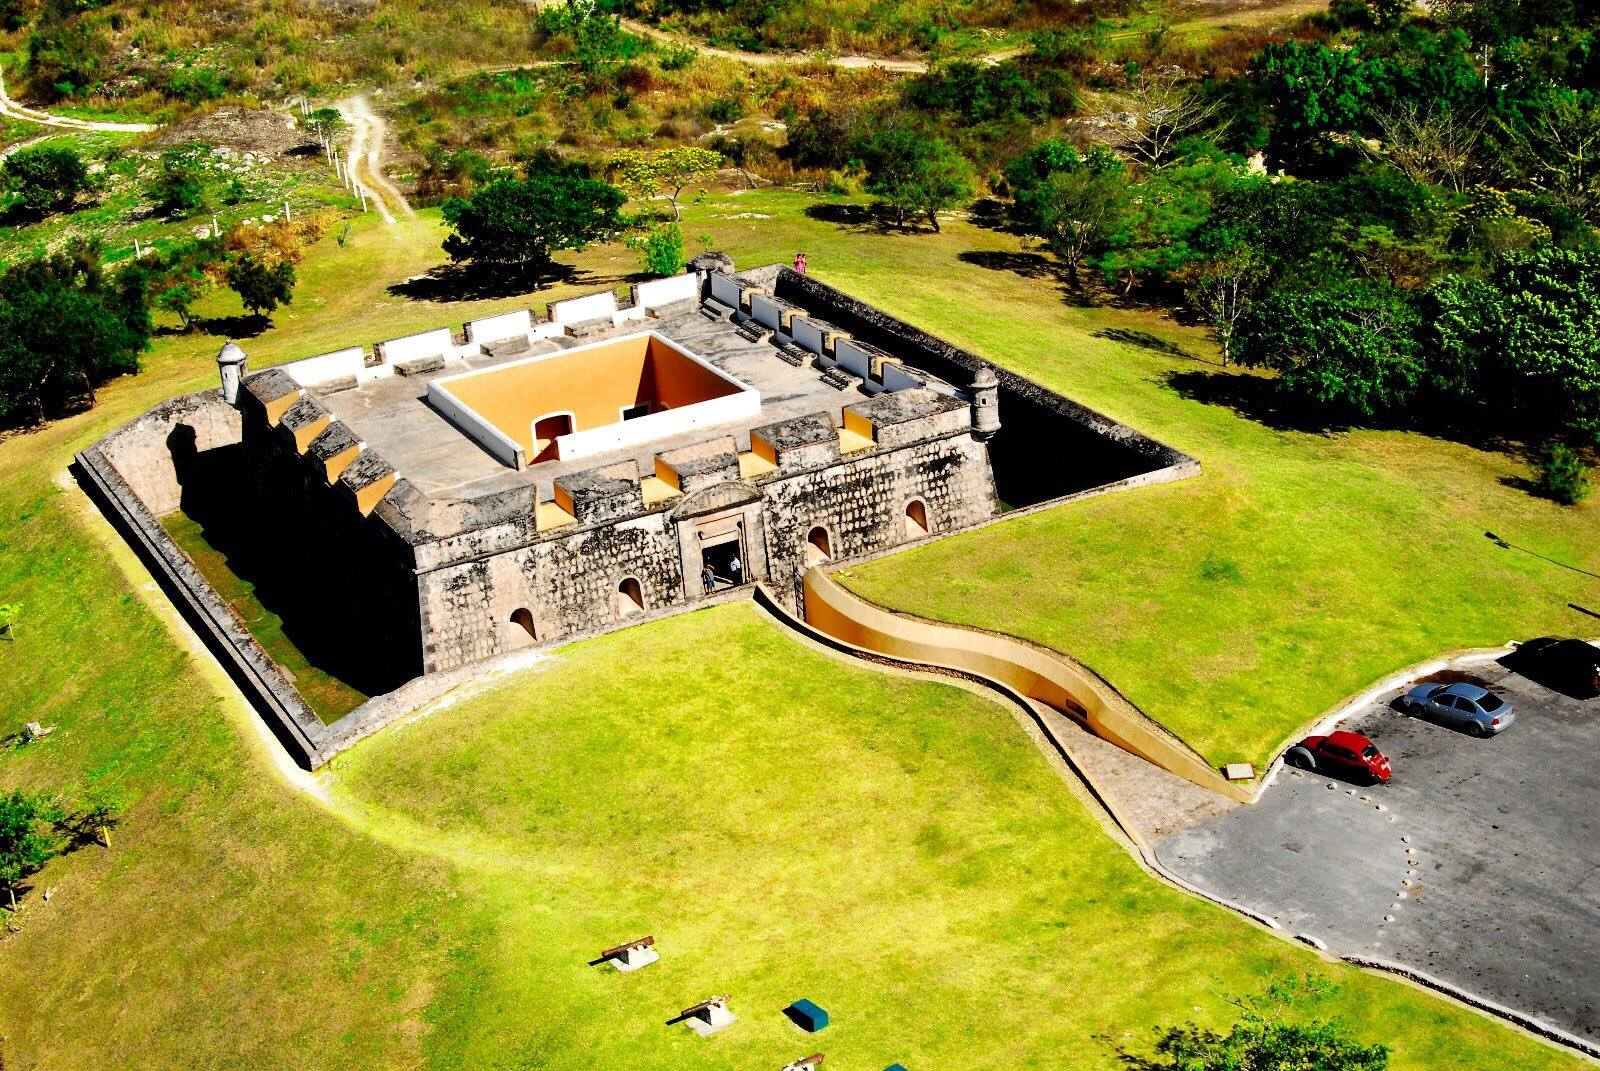 Campeche - Fuerte de San Miguel 2